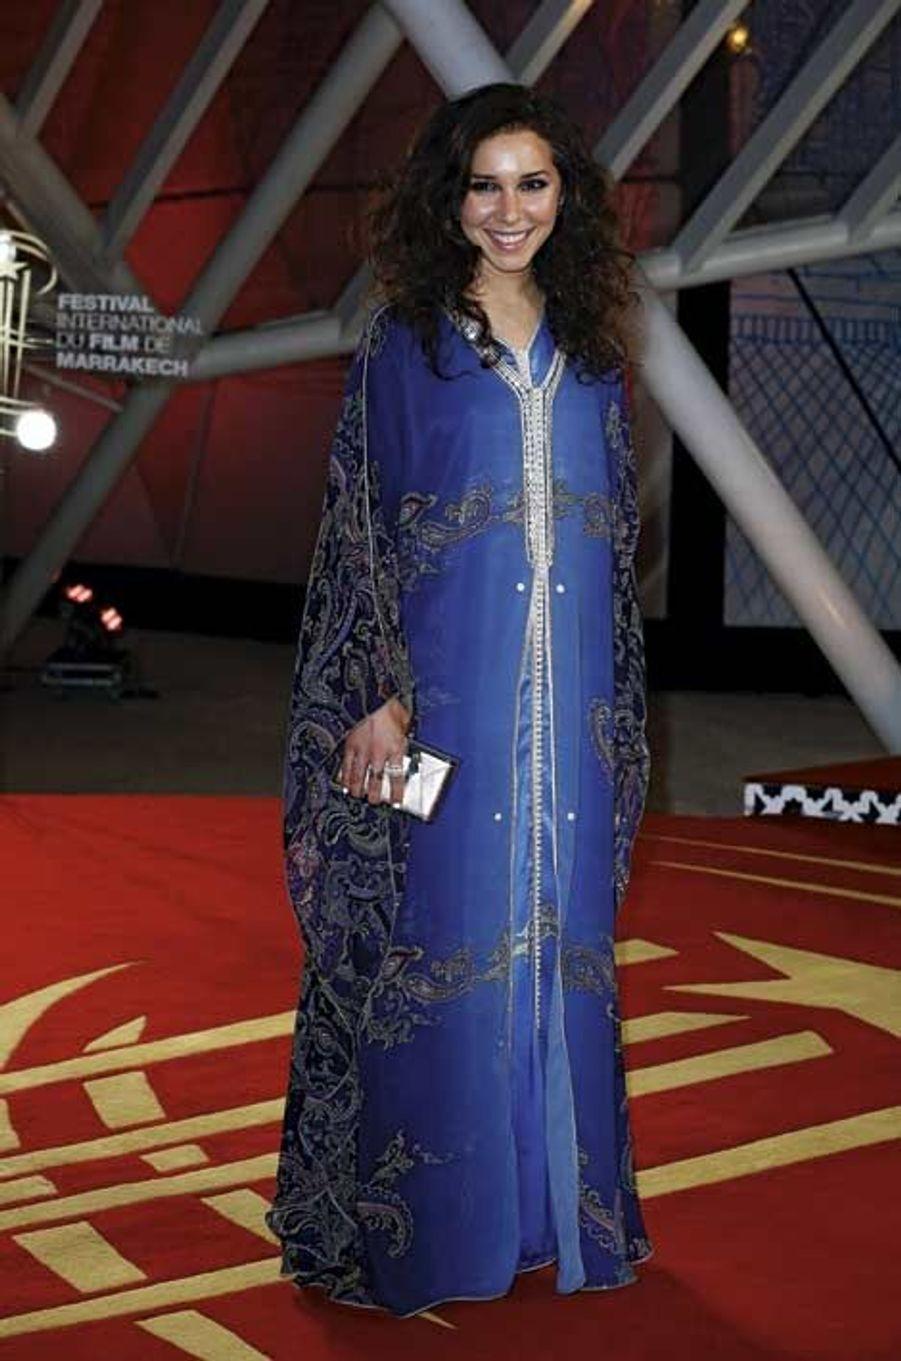 Sofiia Manousha, révélation du cinéma français